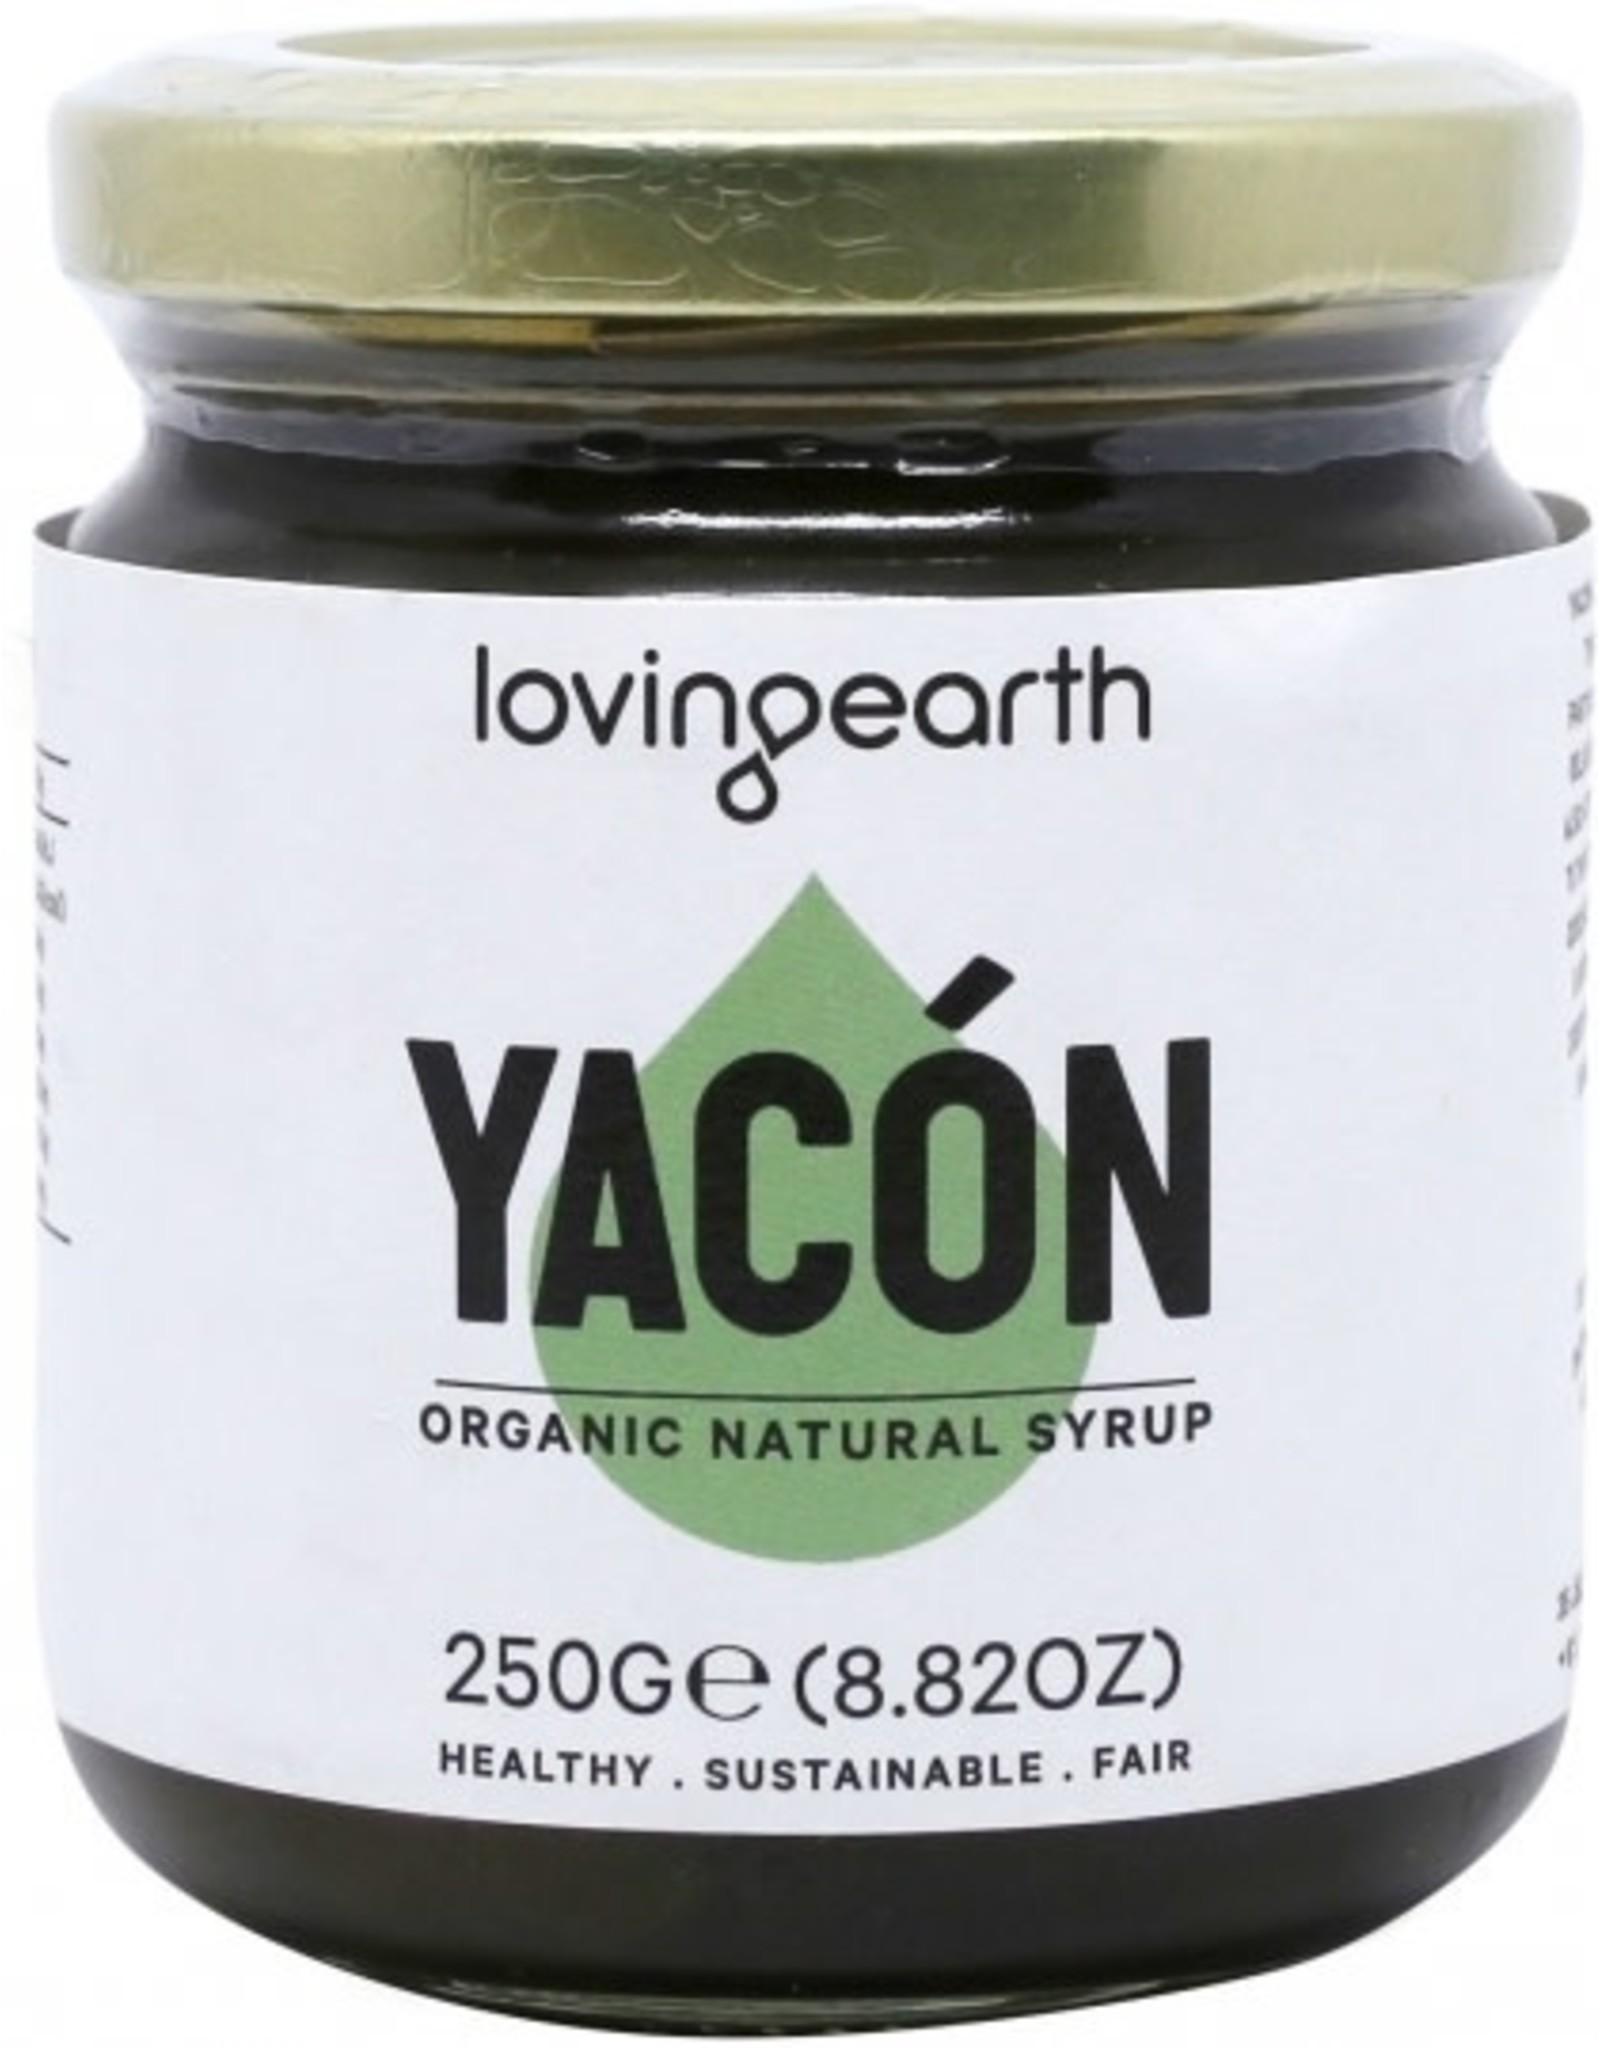 Loving Earth Yacon Syrup 250g